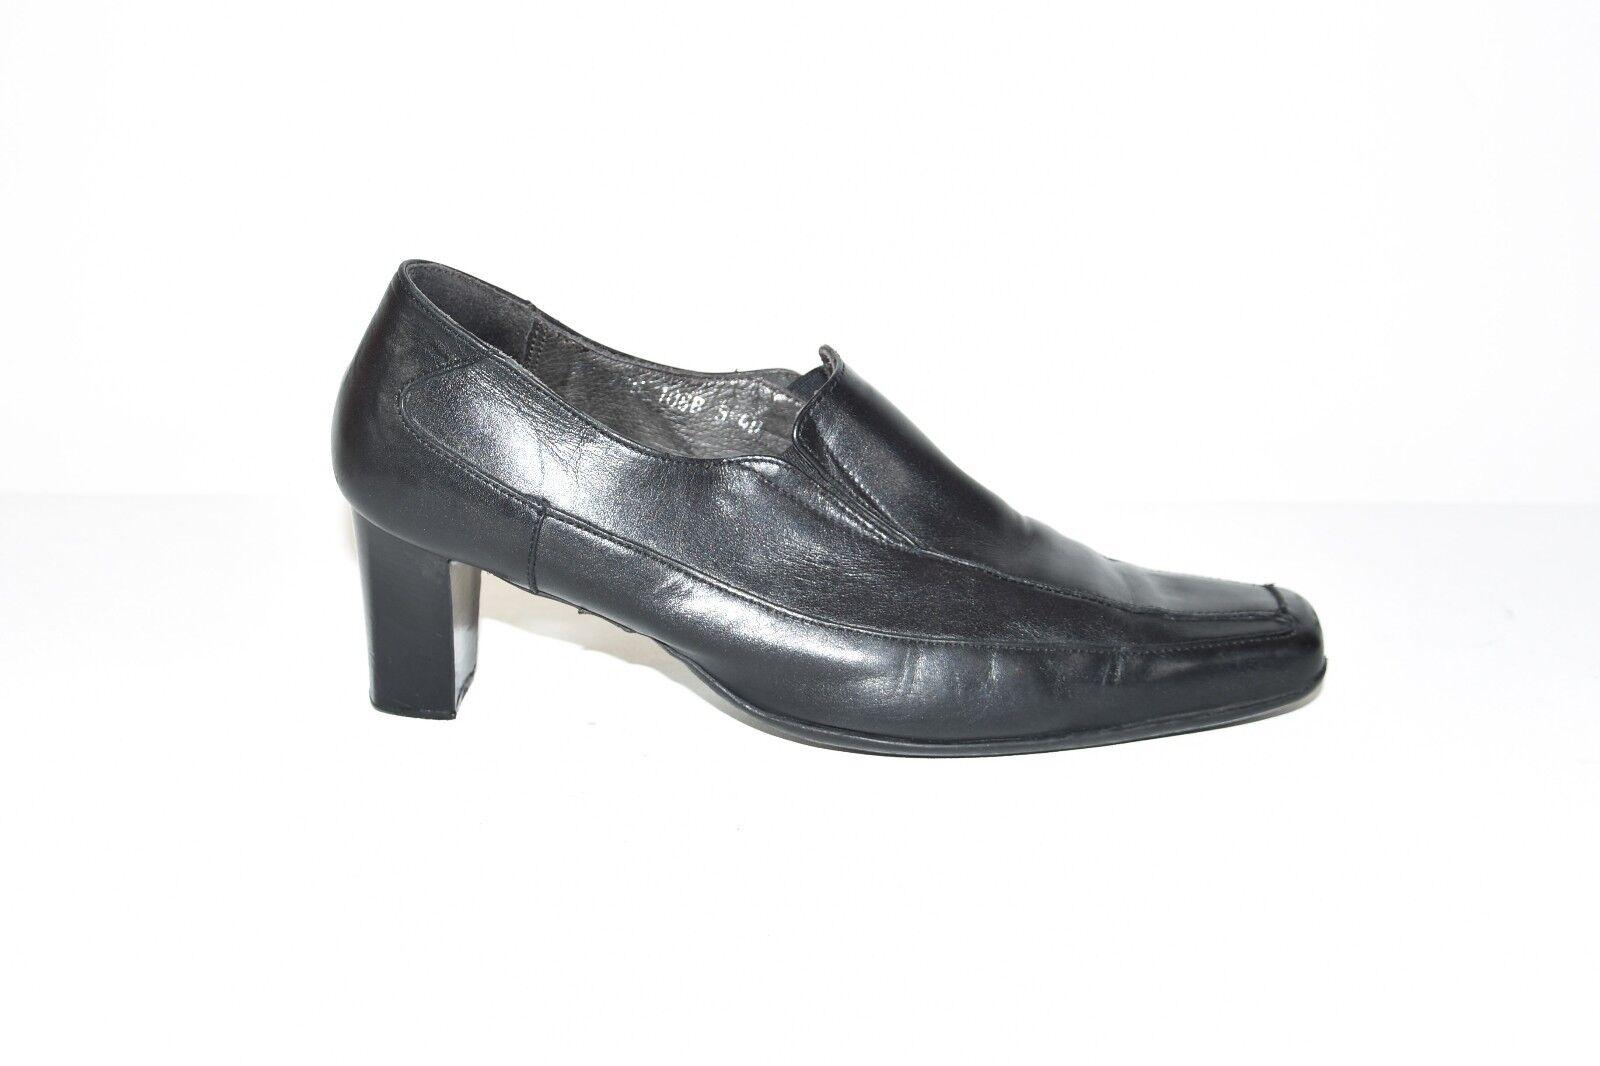 Black Real Leather BLUE Slip Women's On Mid Heel Court Women's Slip Shoes Heels Size 7/40 18569d